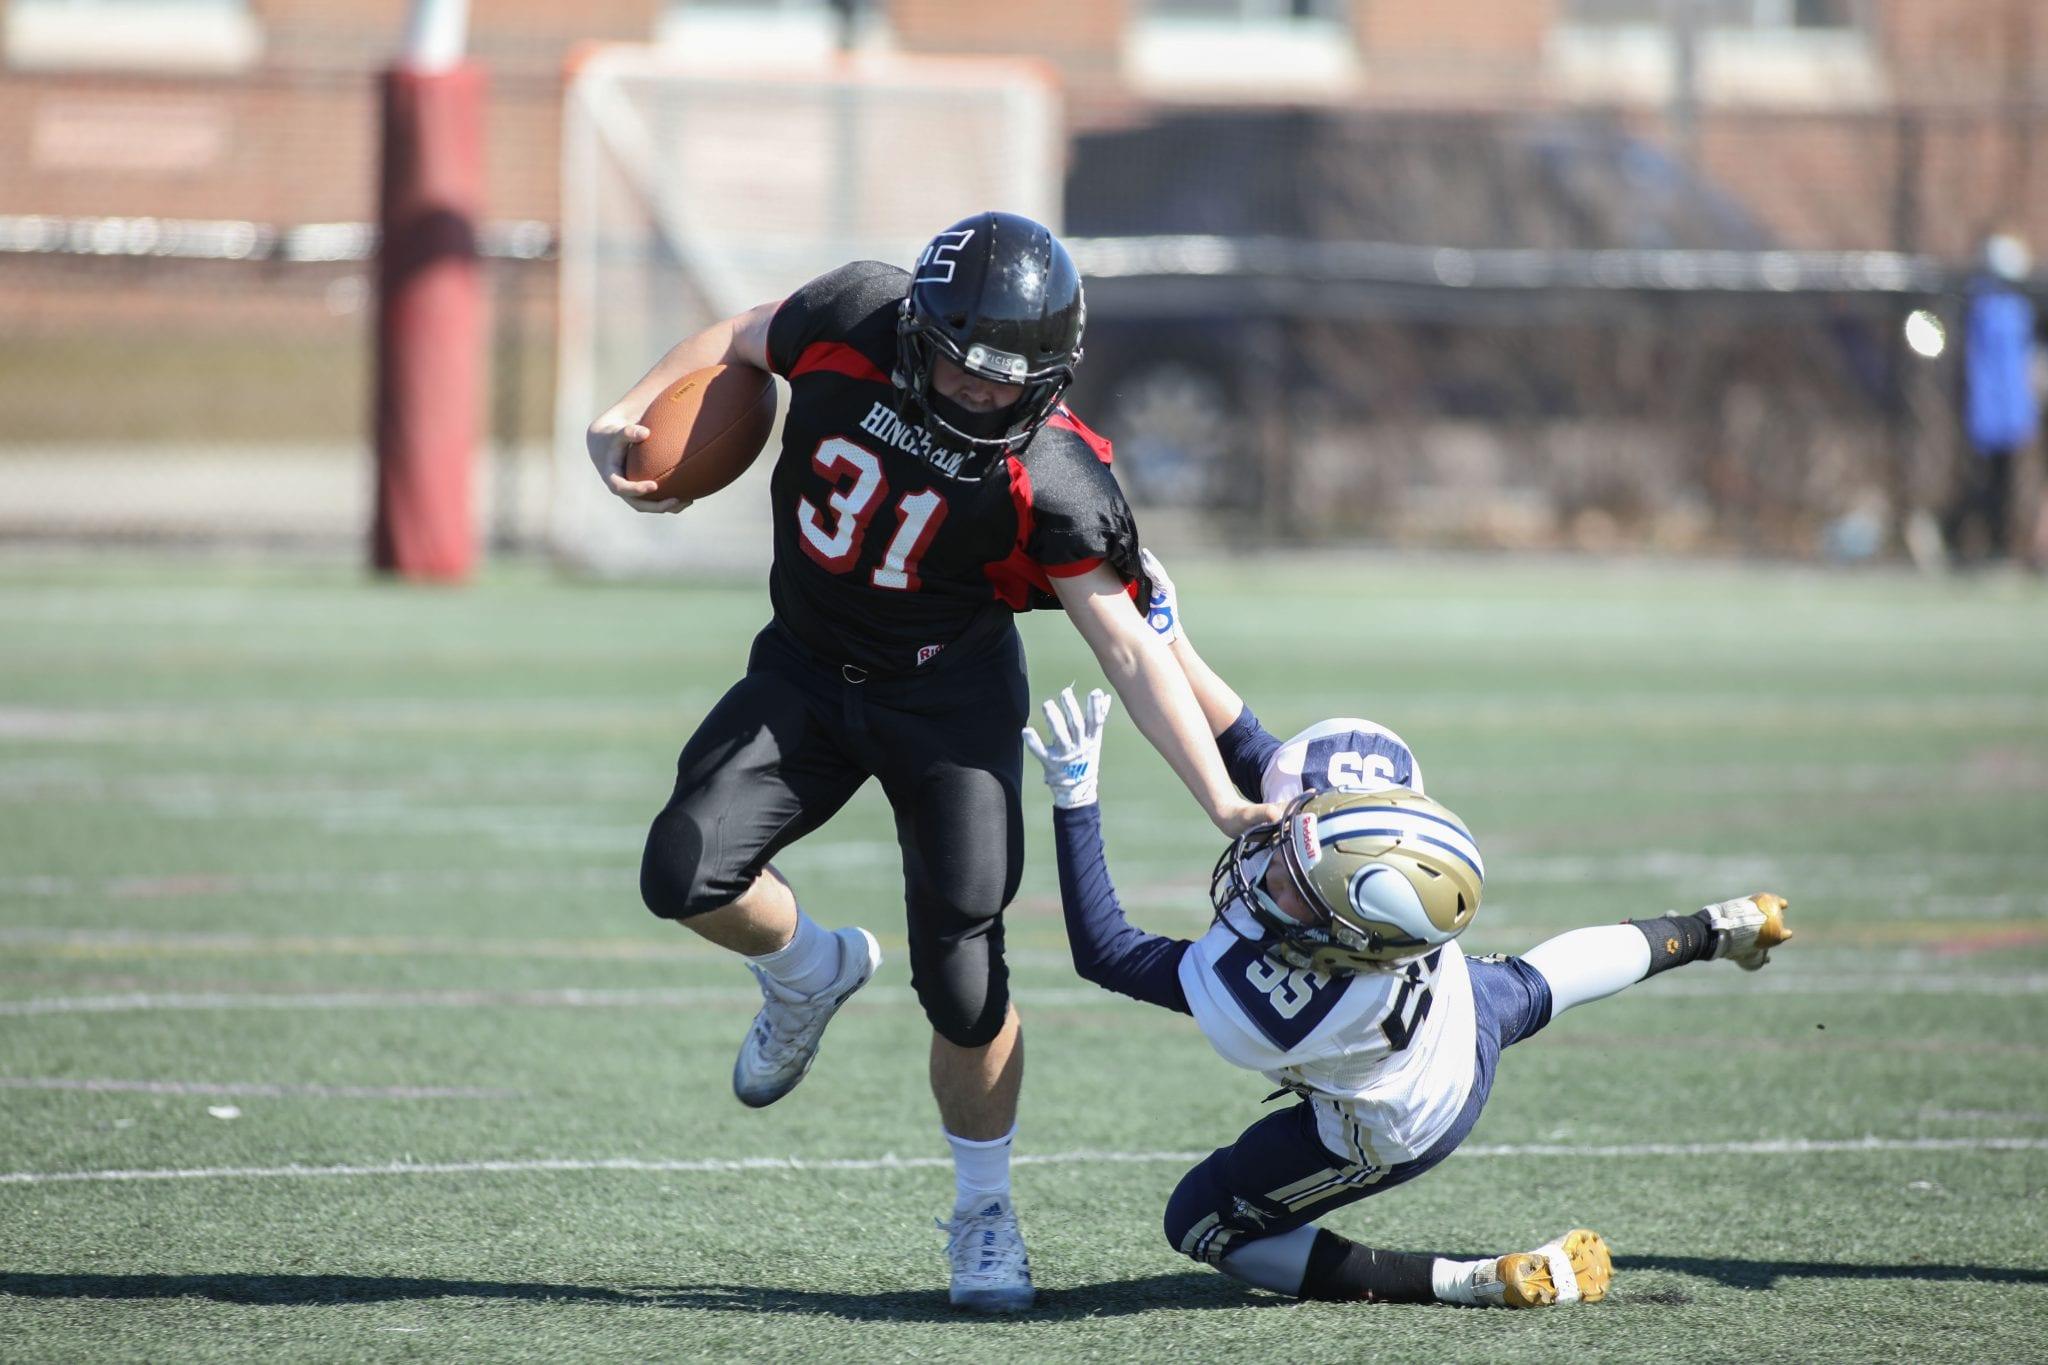 Mason Lennon stiff arms an East Bridgewater tackler.